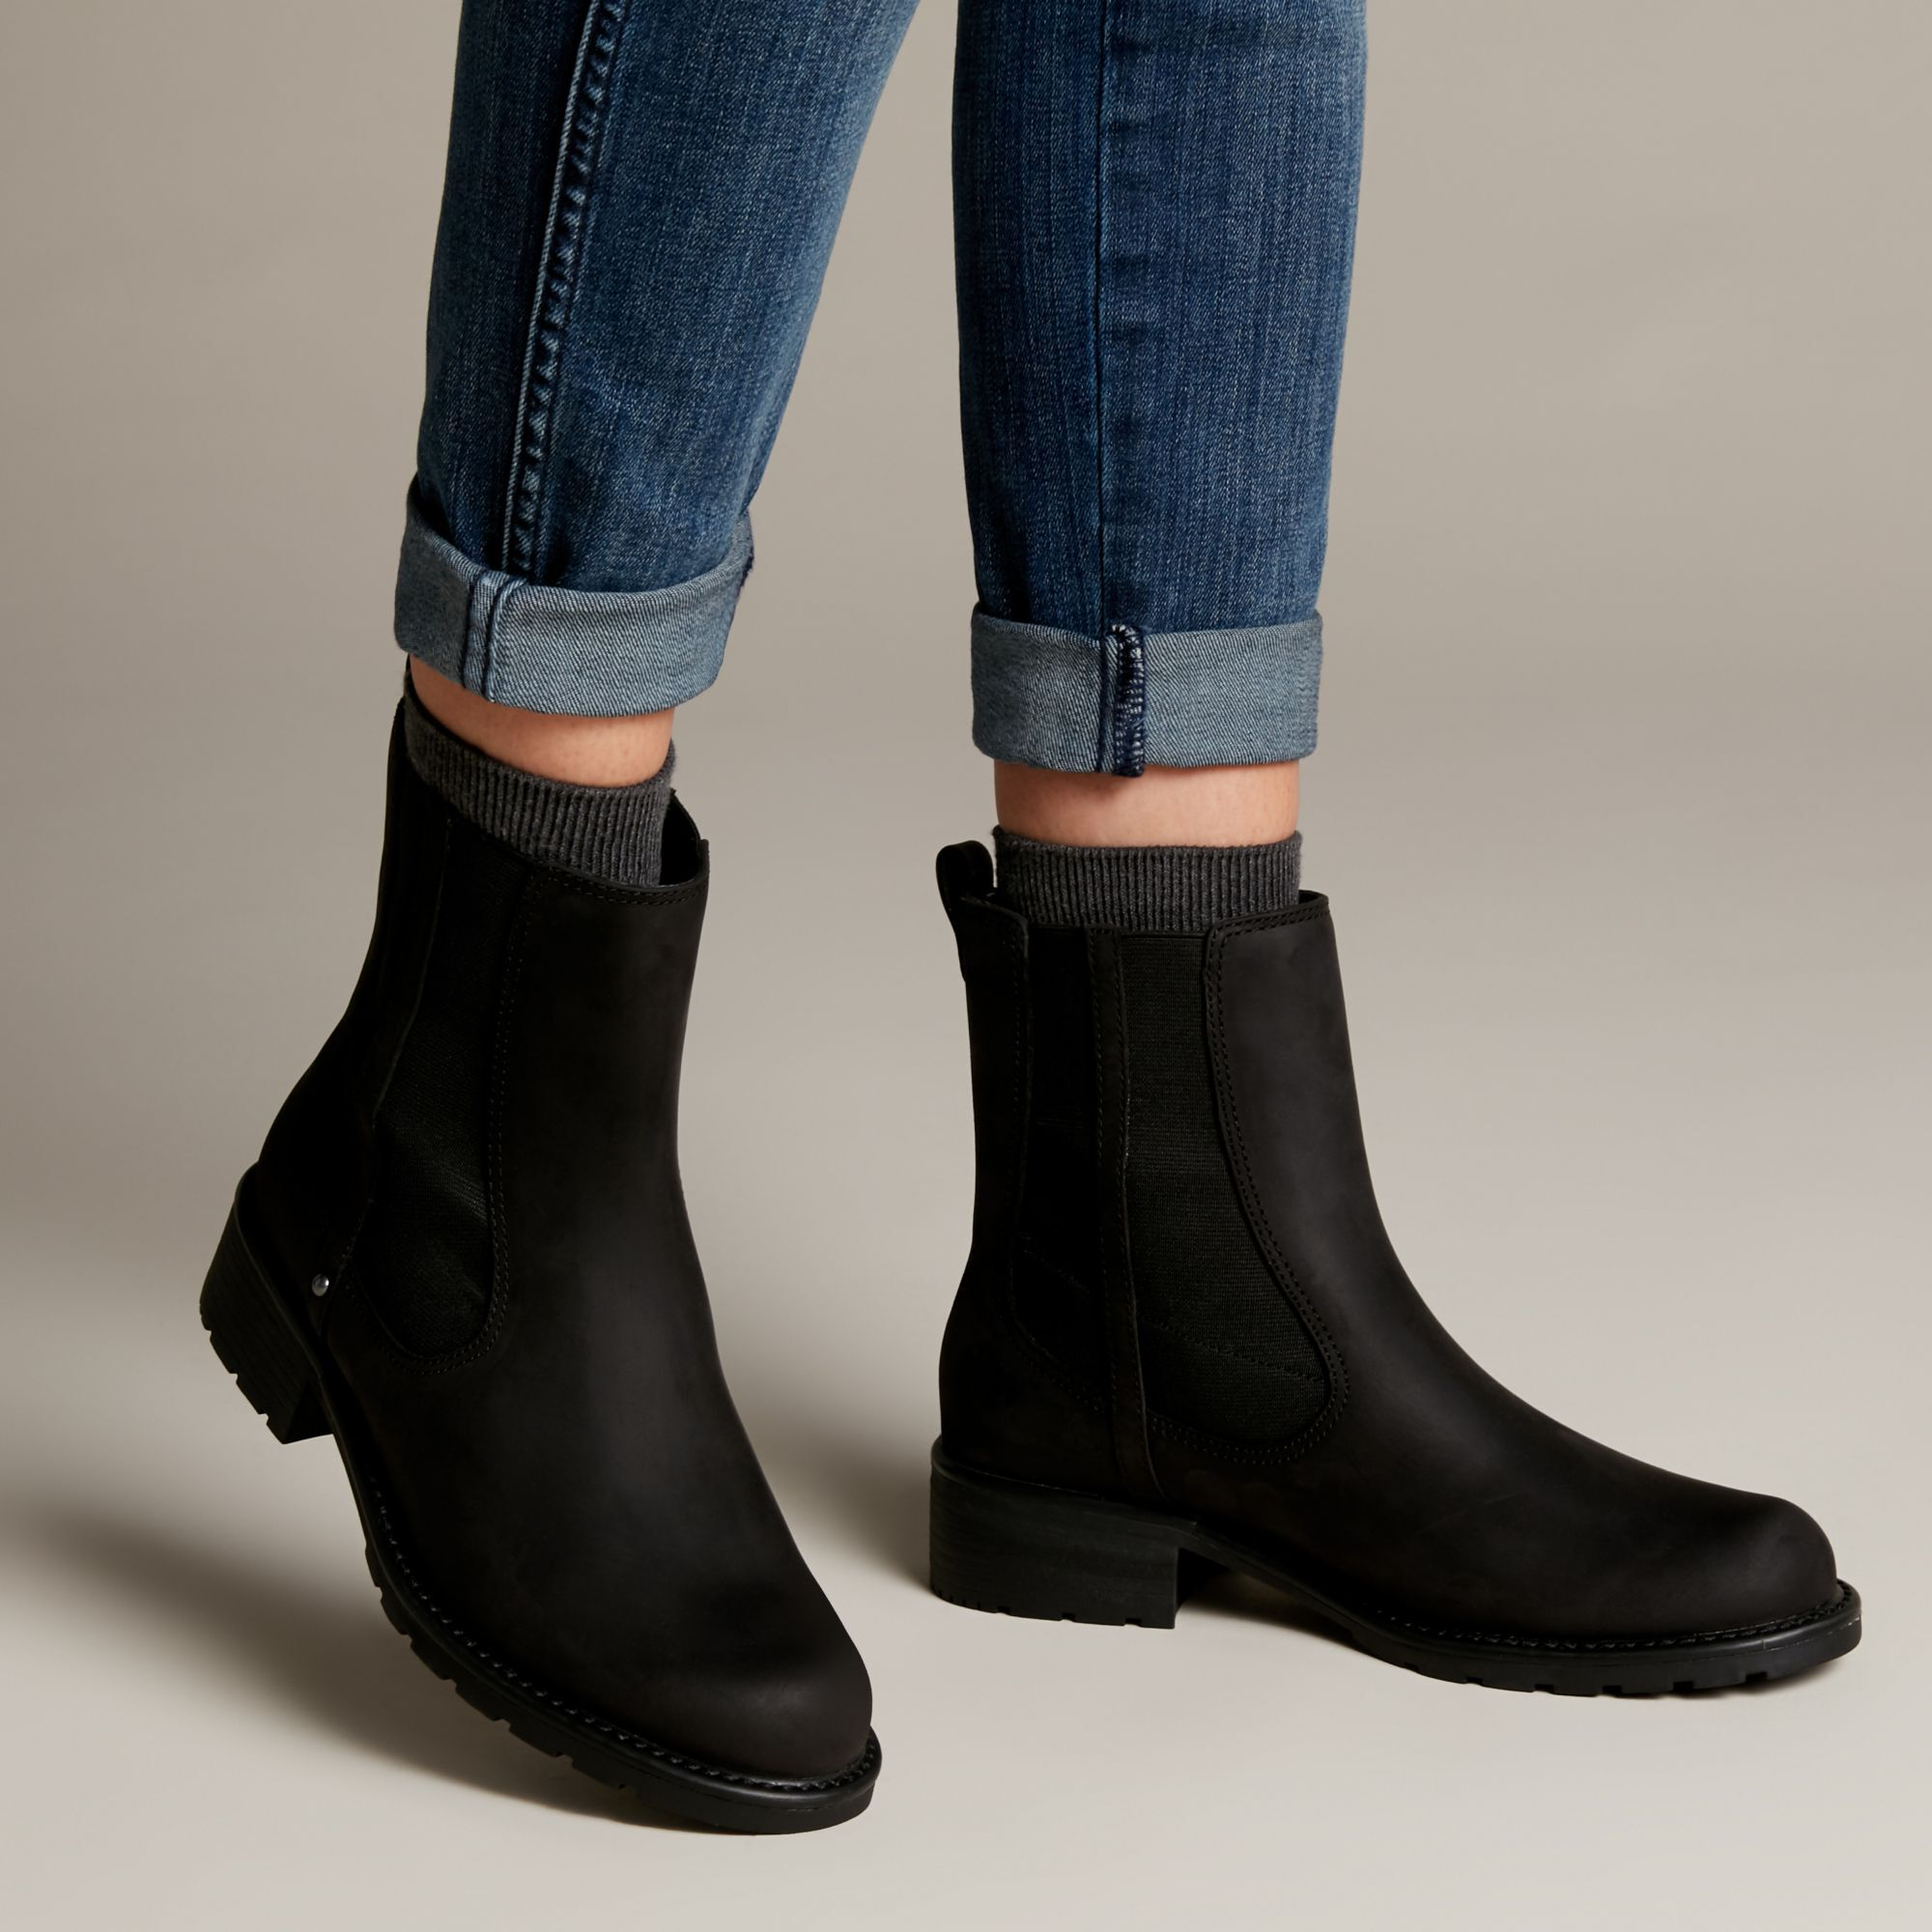 Women's Black Leather Chelsea Boots